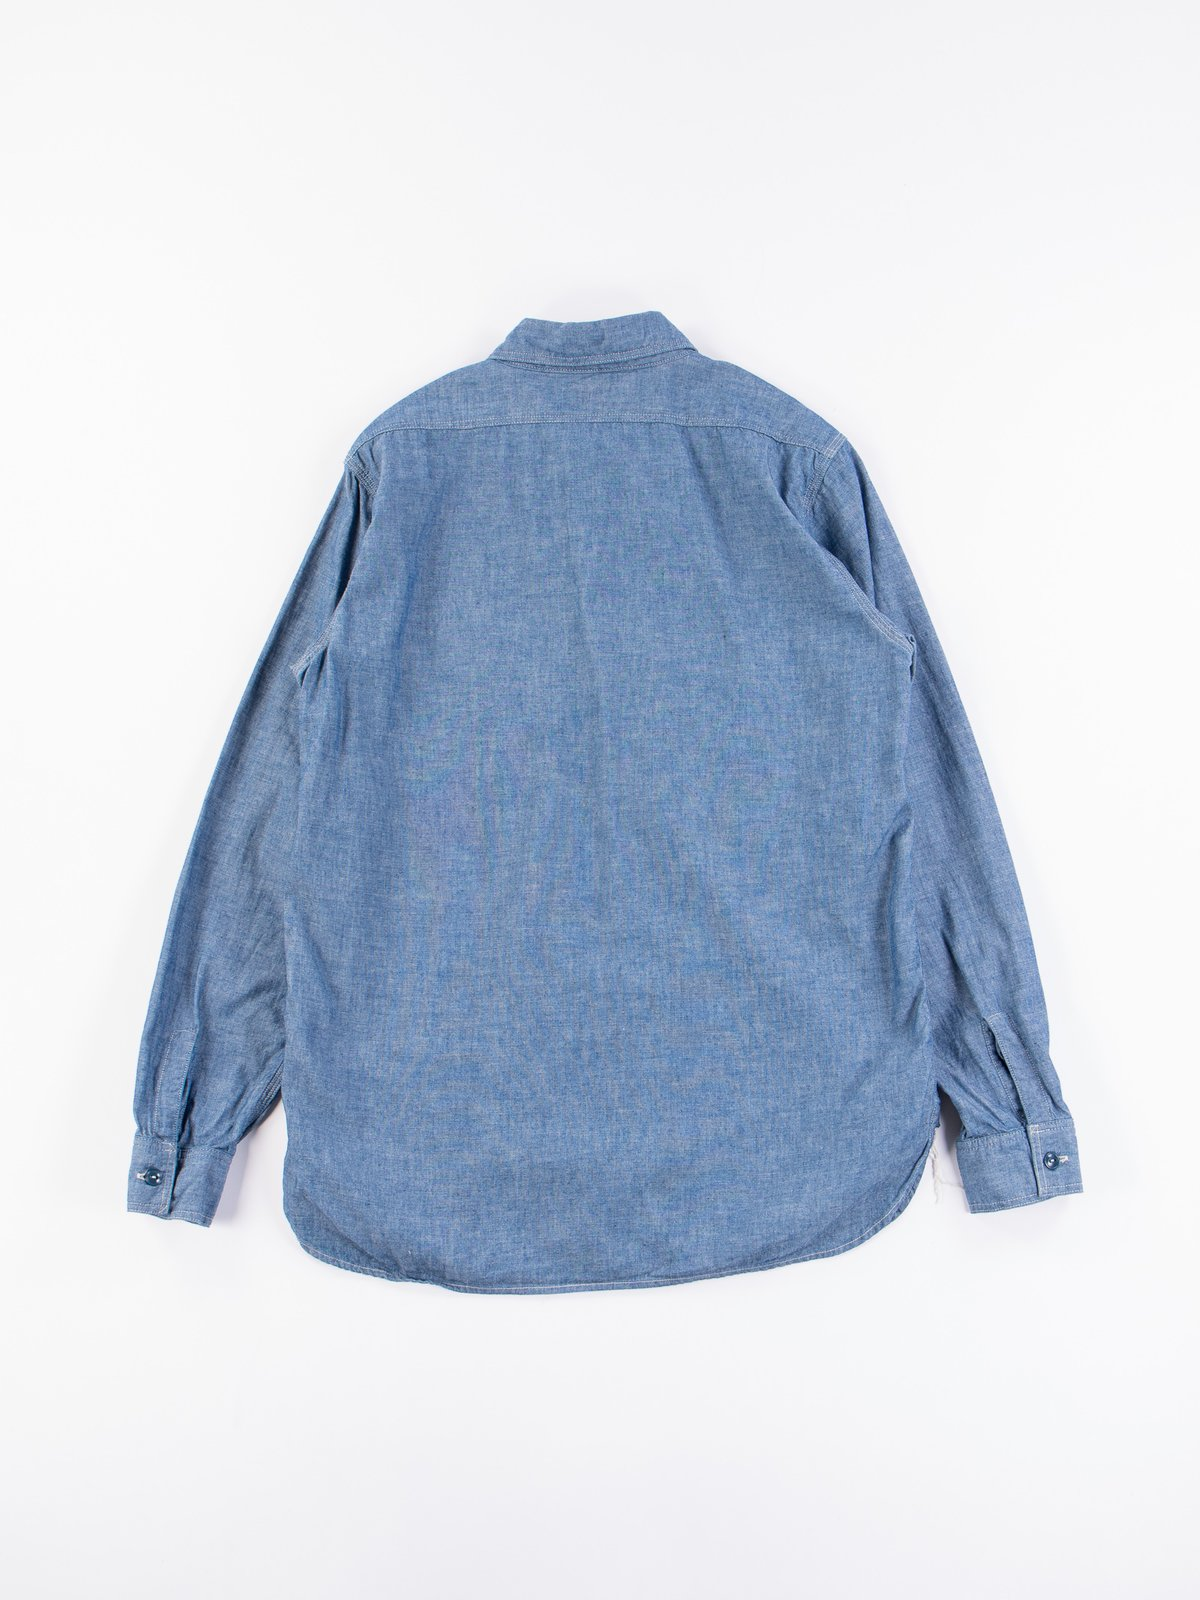 Blue Chambray Work Shirt - Image 5